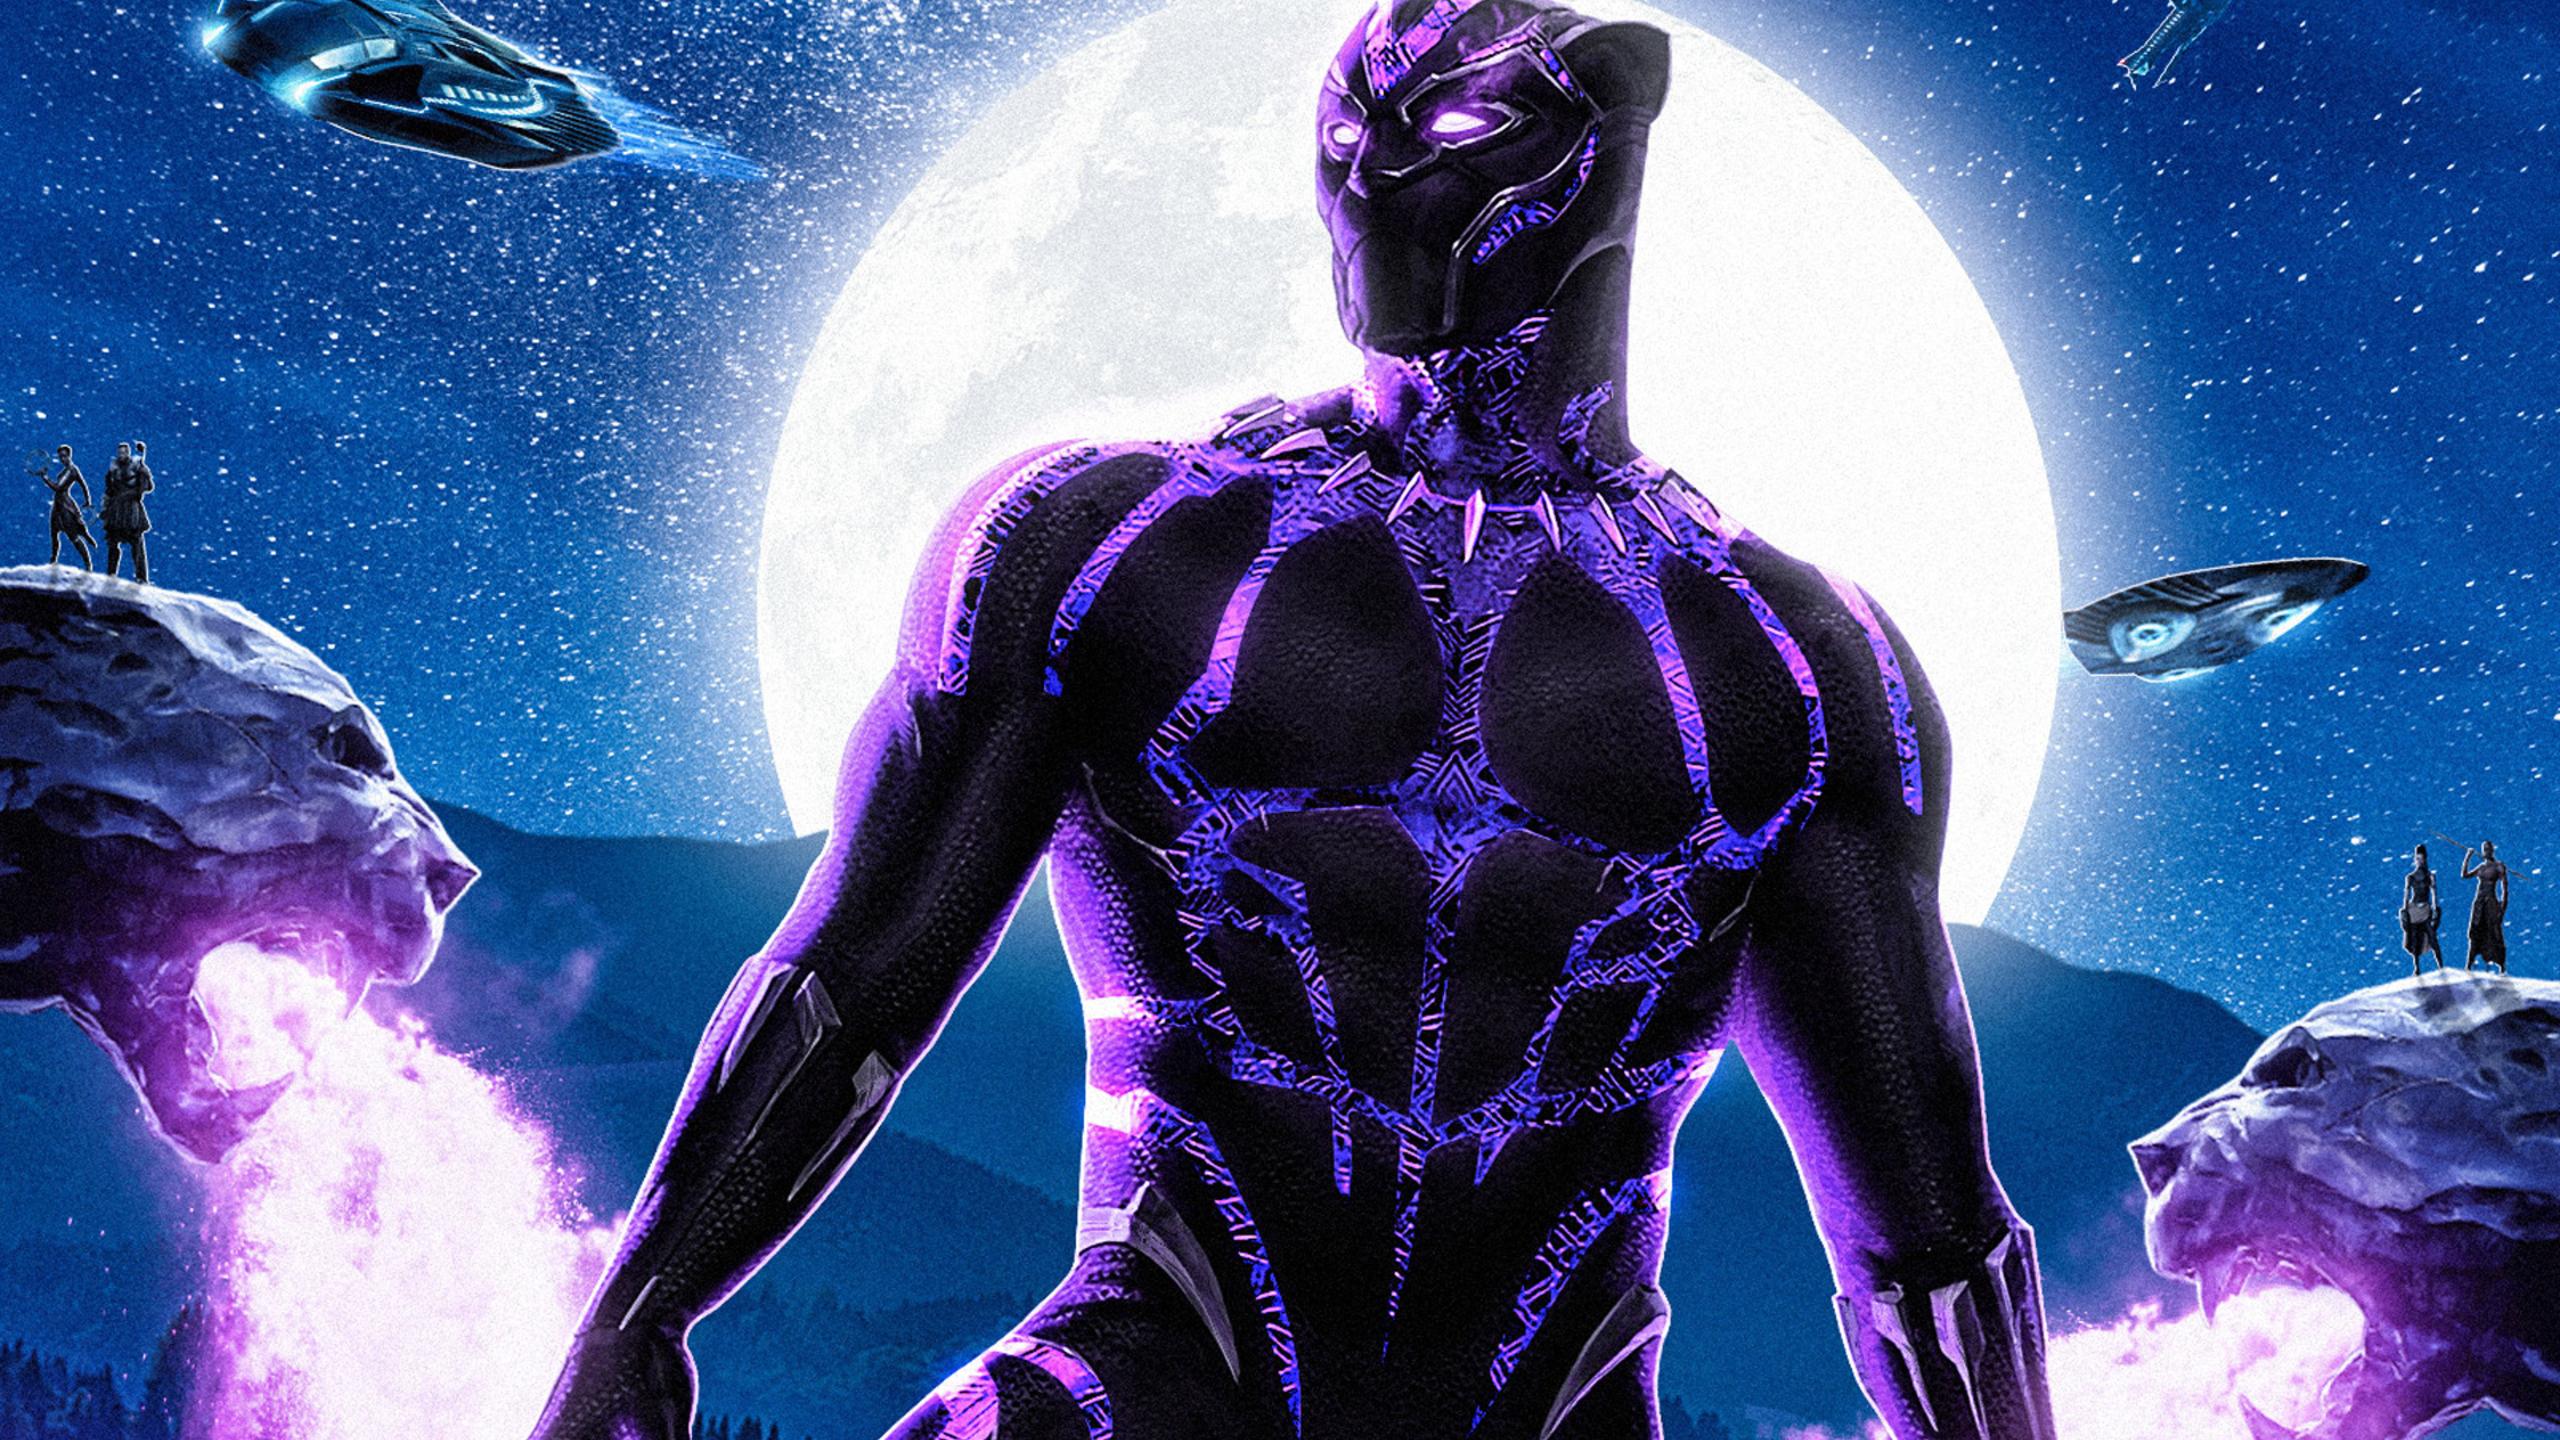 2560x1440 Black Panther Movie 2018 Artwork 1440P ...